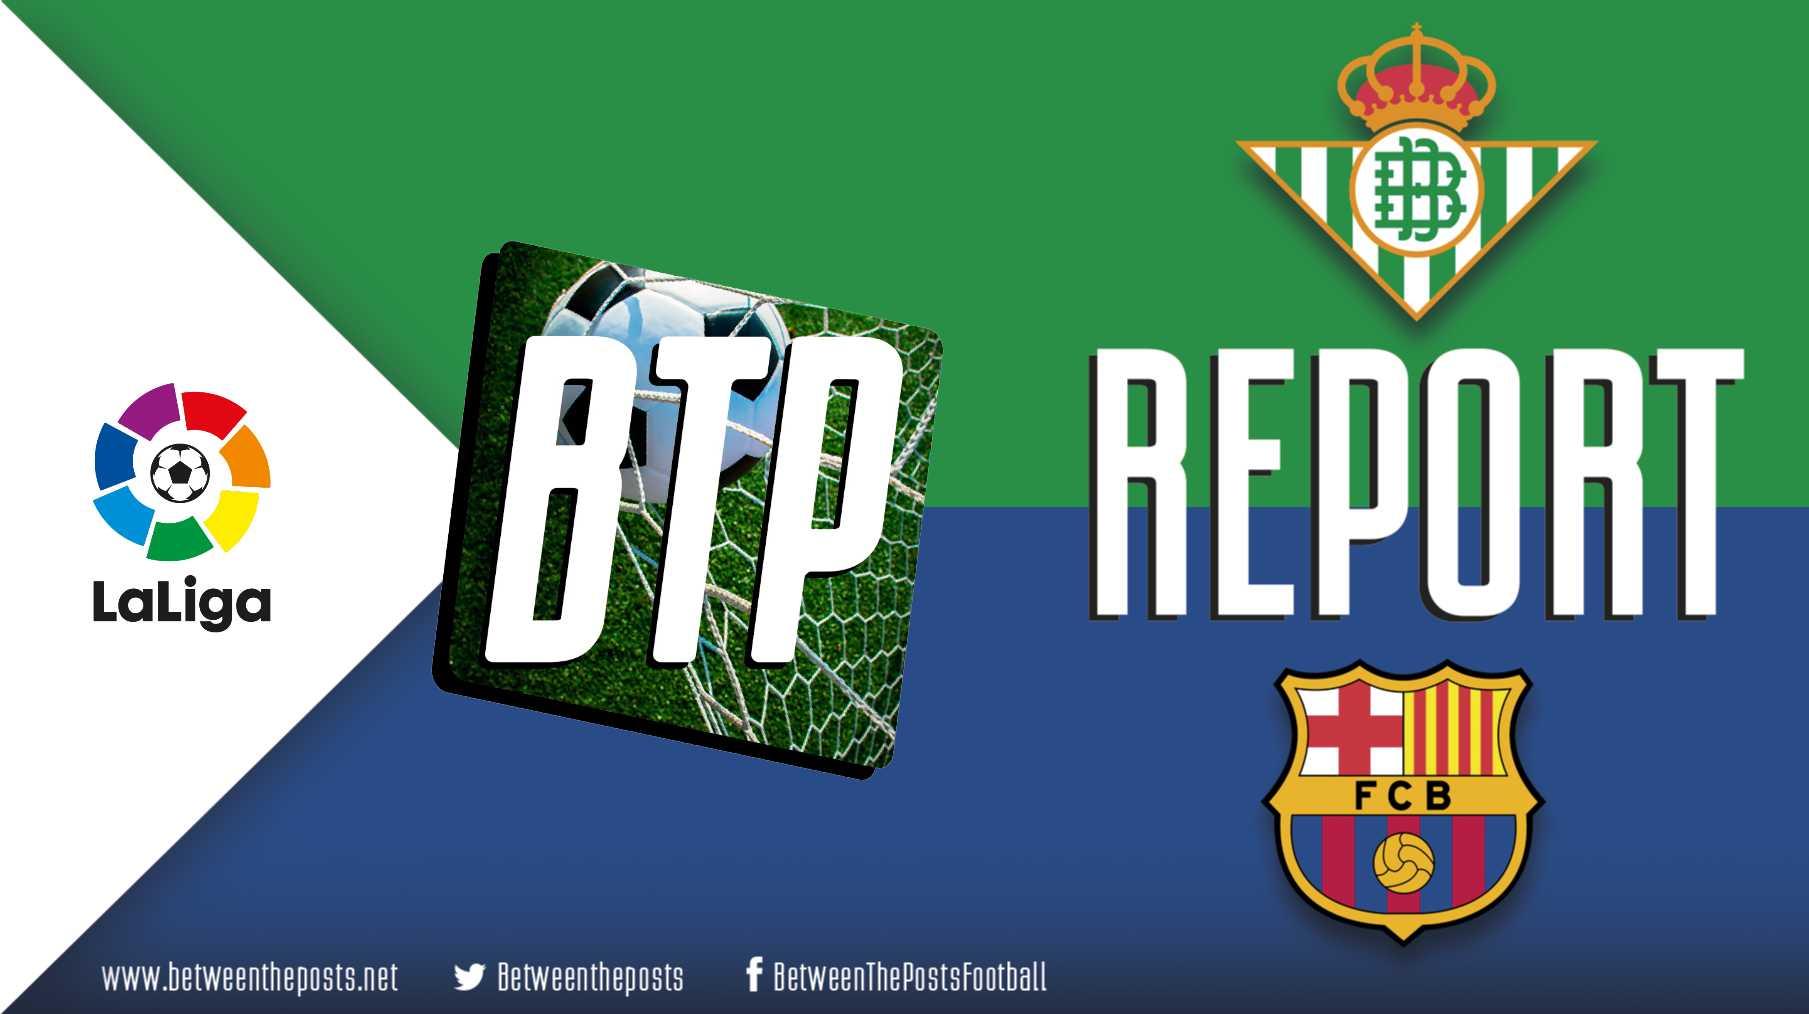 Real Betis Barcelona 2-3 LaLiga